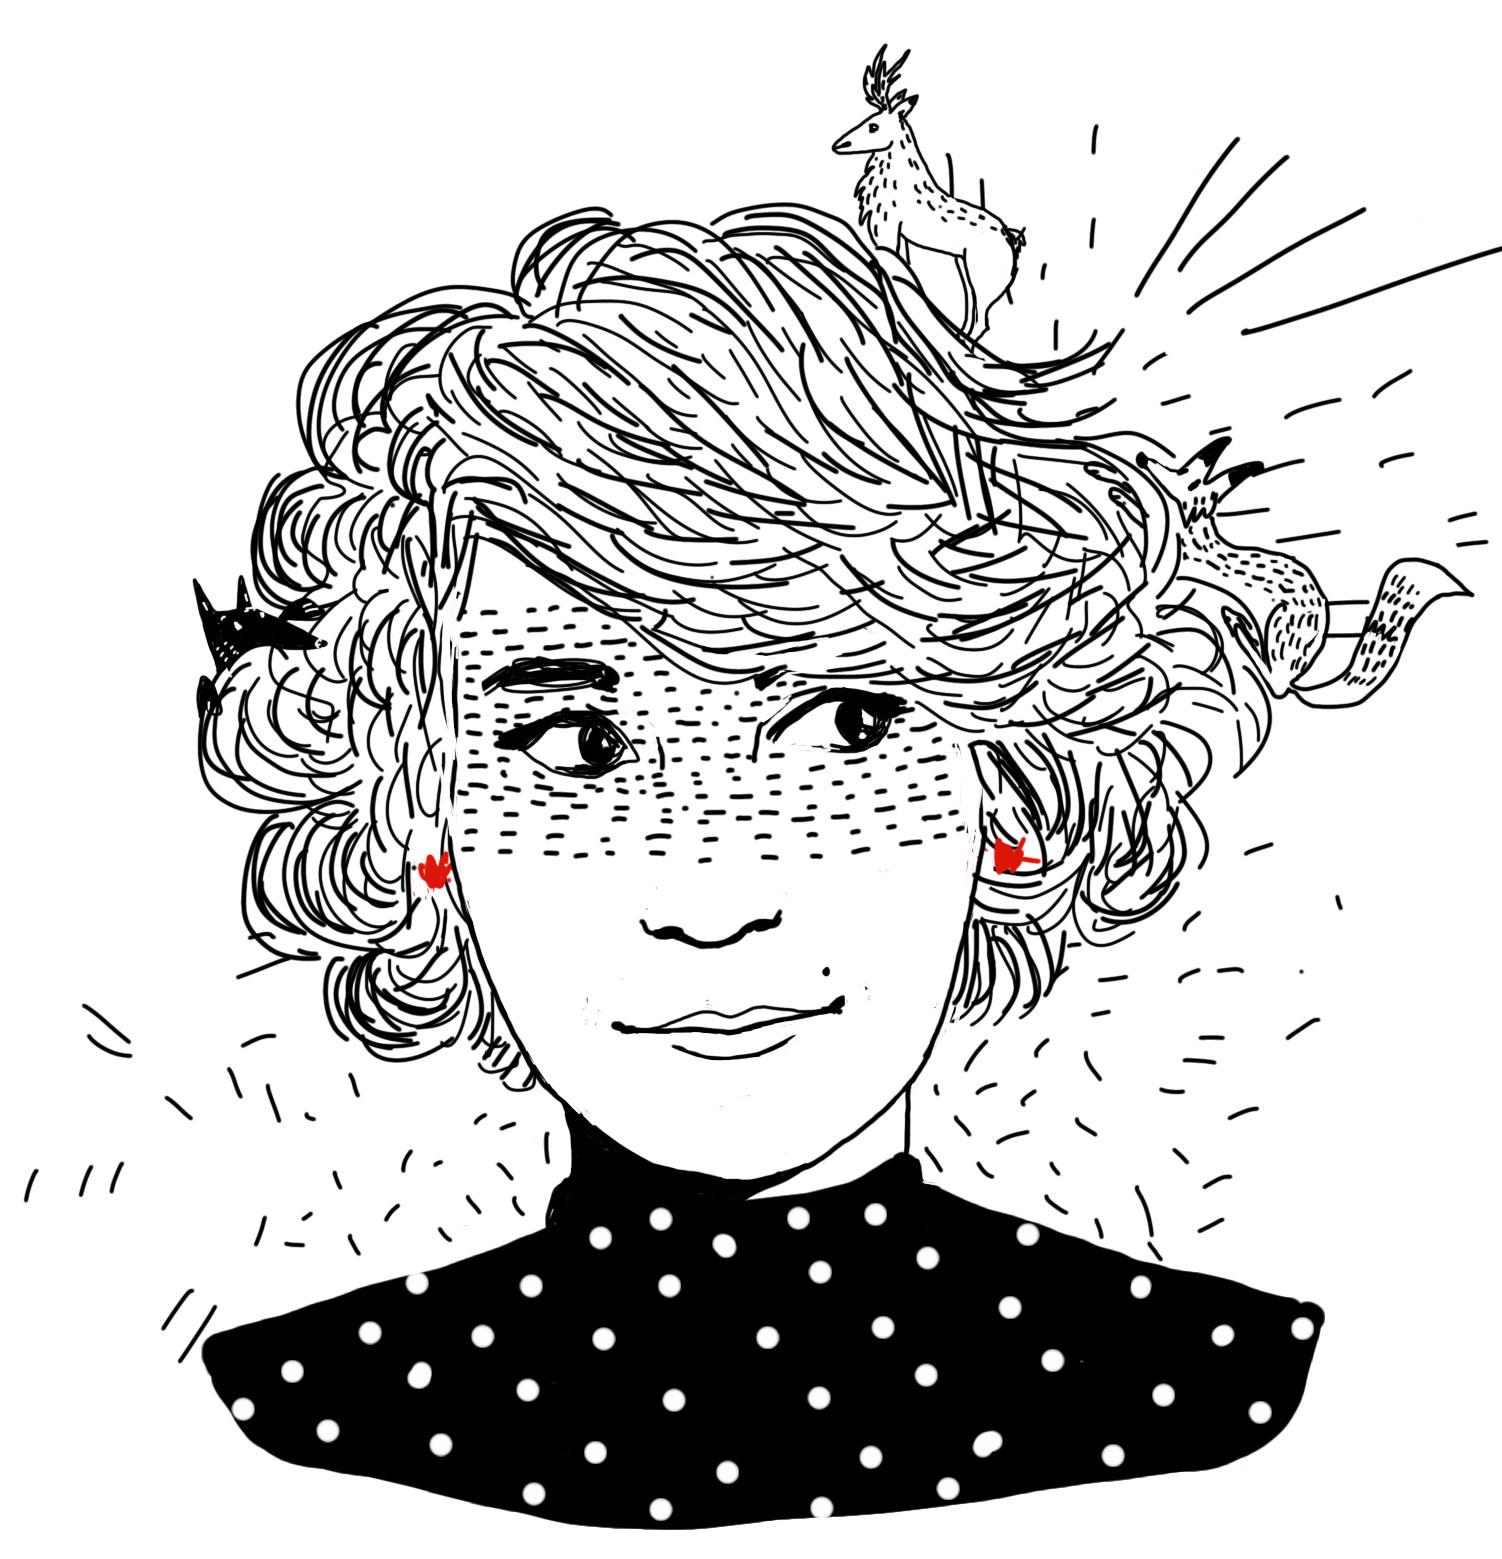 Adèle Bontoux